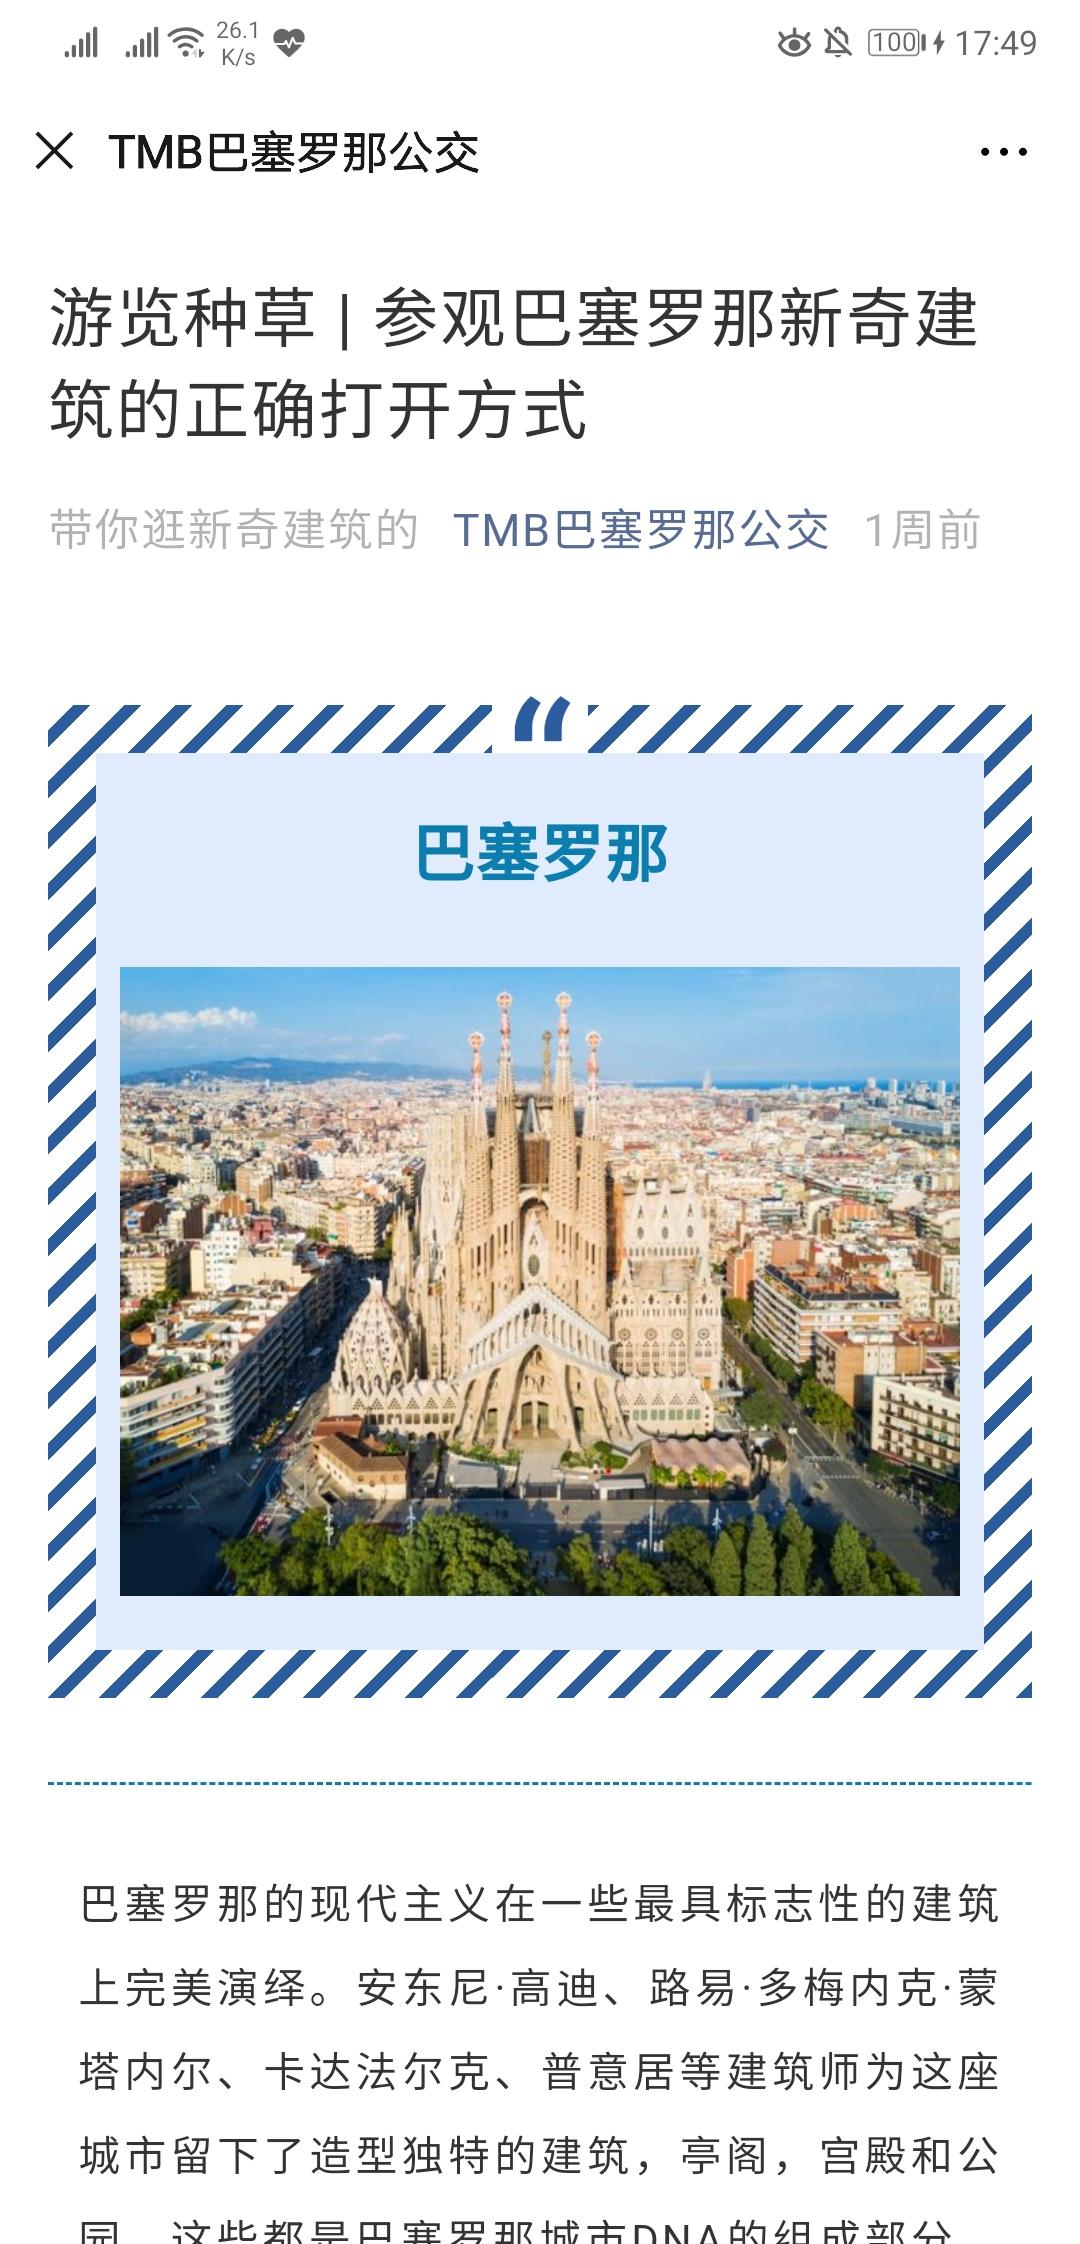 WeChat Mini Program Barcelona